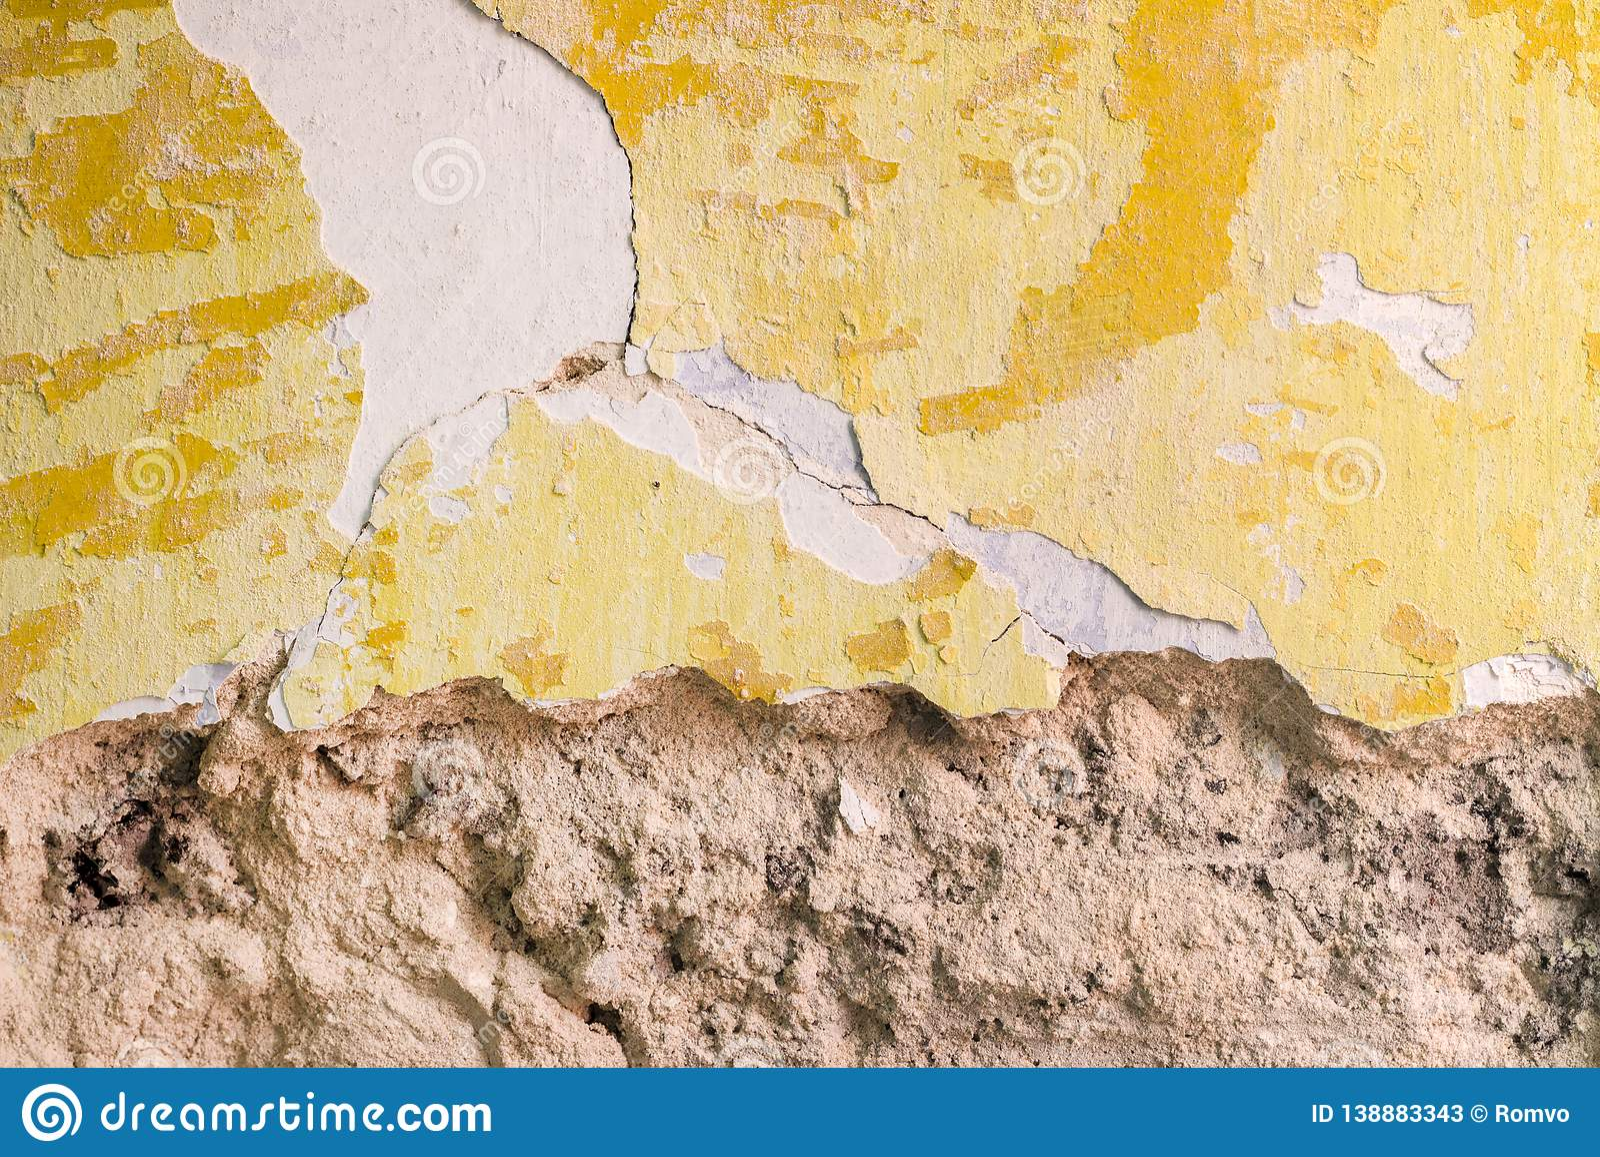 Knocking Wall Plaster Repair Stock Image - Image of board